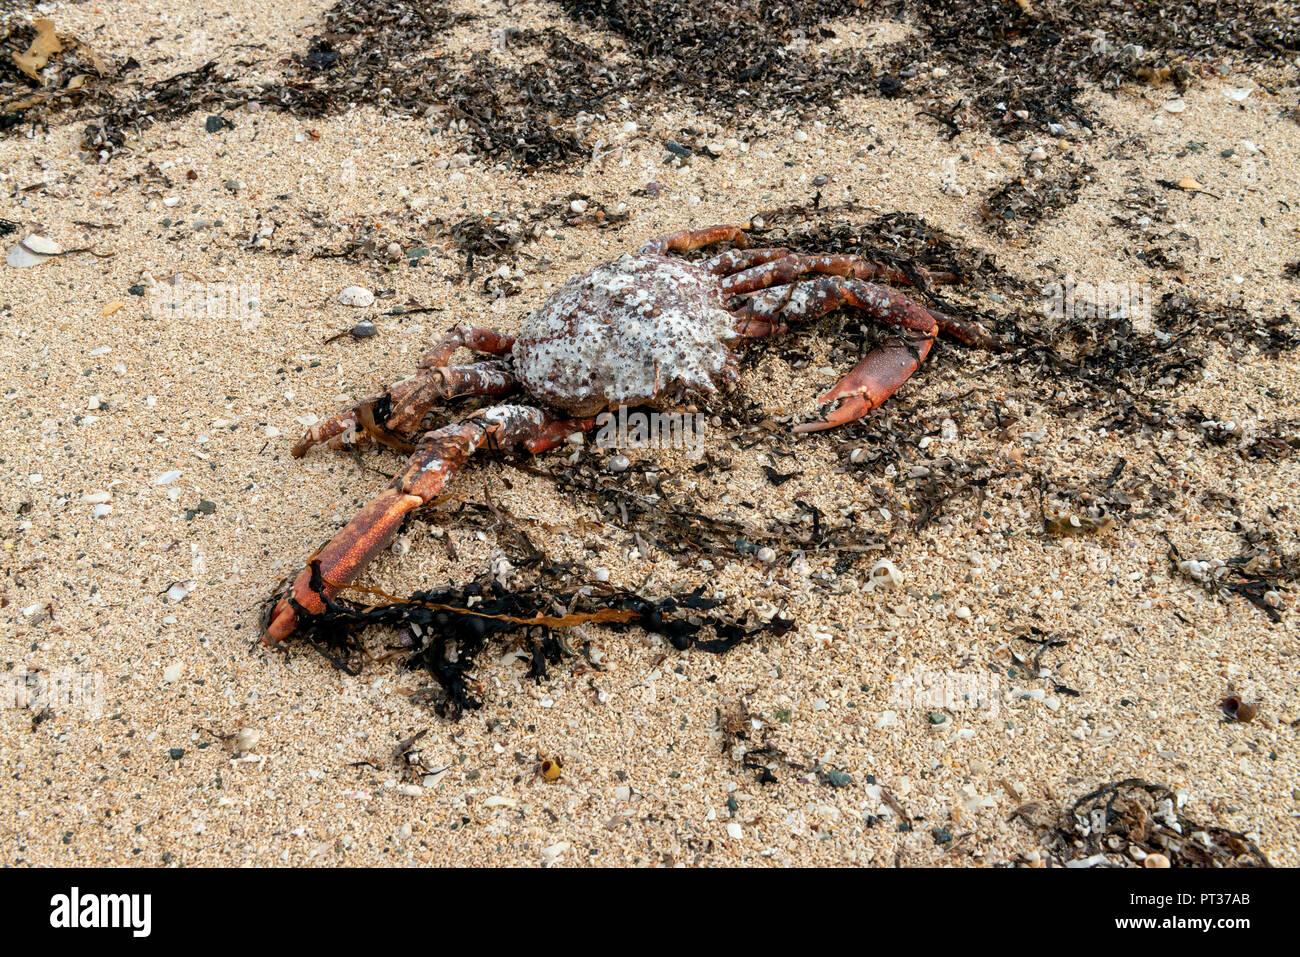 Dead Crab on a Beach, Ireland, Atlantic Ocean. - Stock Image